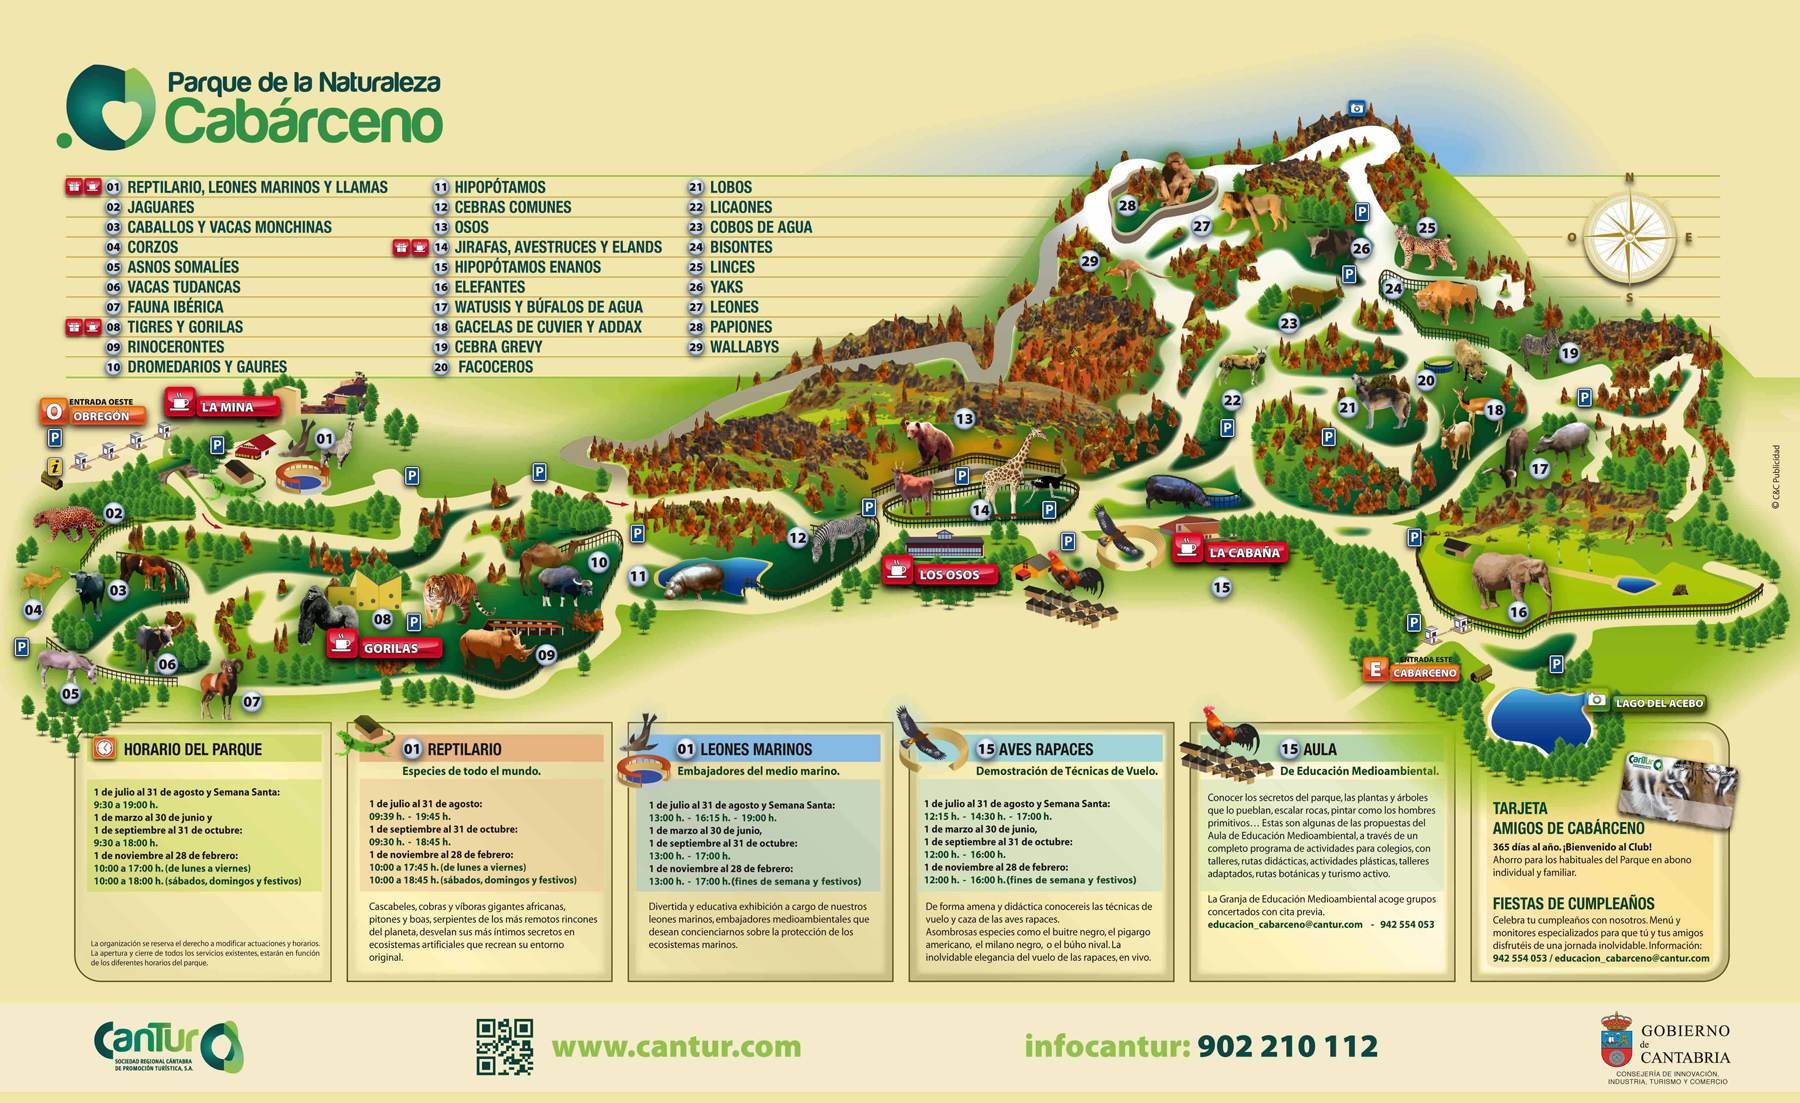 Mapa de Cabarceno (vía cantur.com)